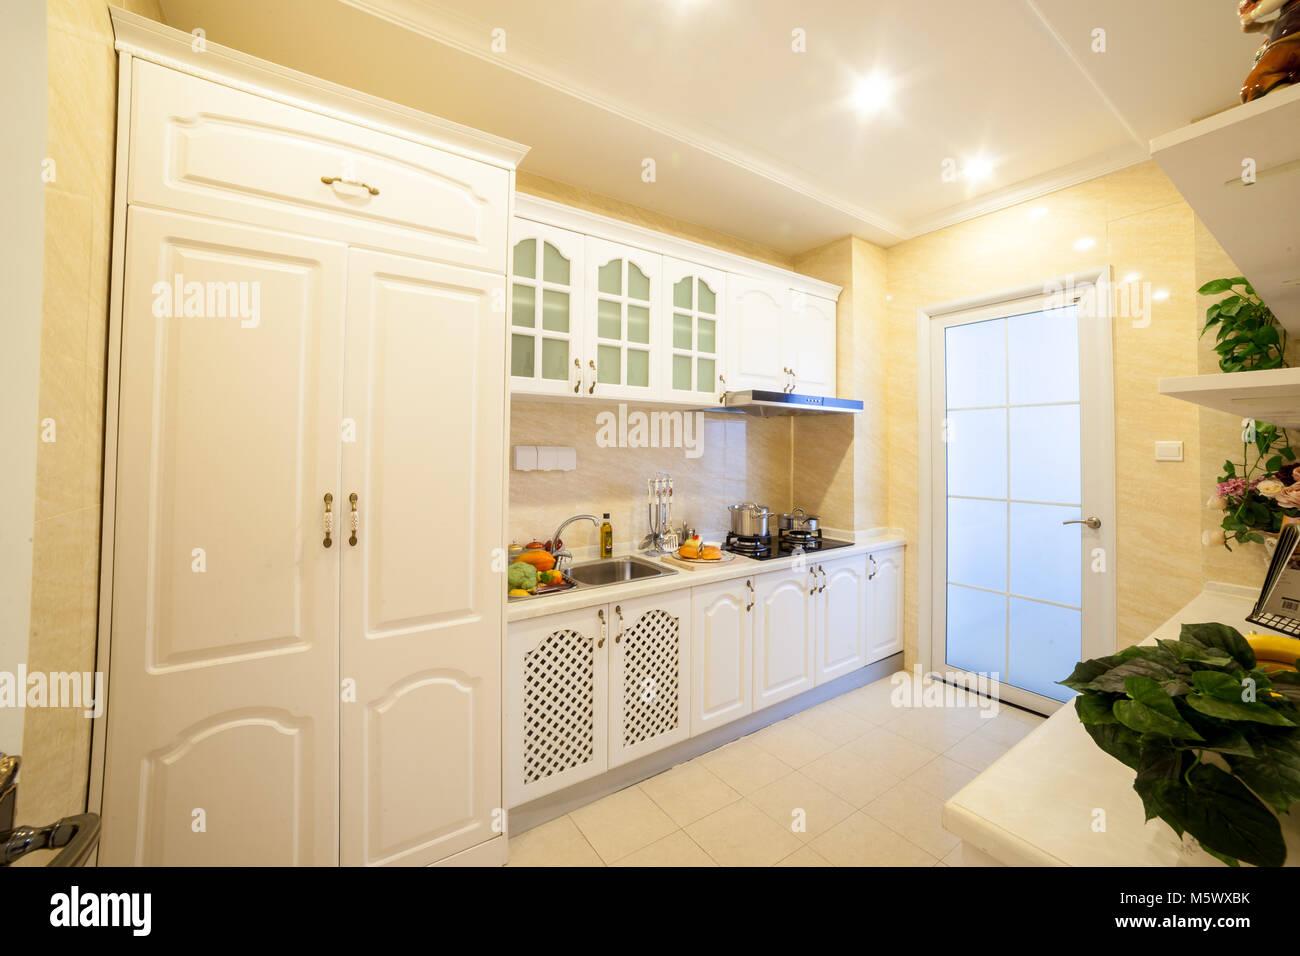 The Kitchen, White Furniture, China Housing Units   Stock Image